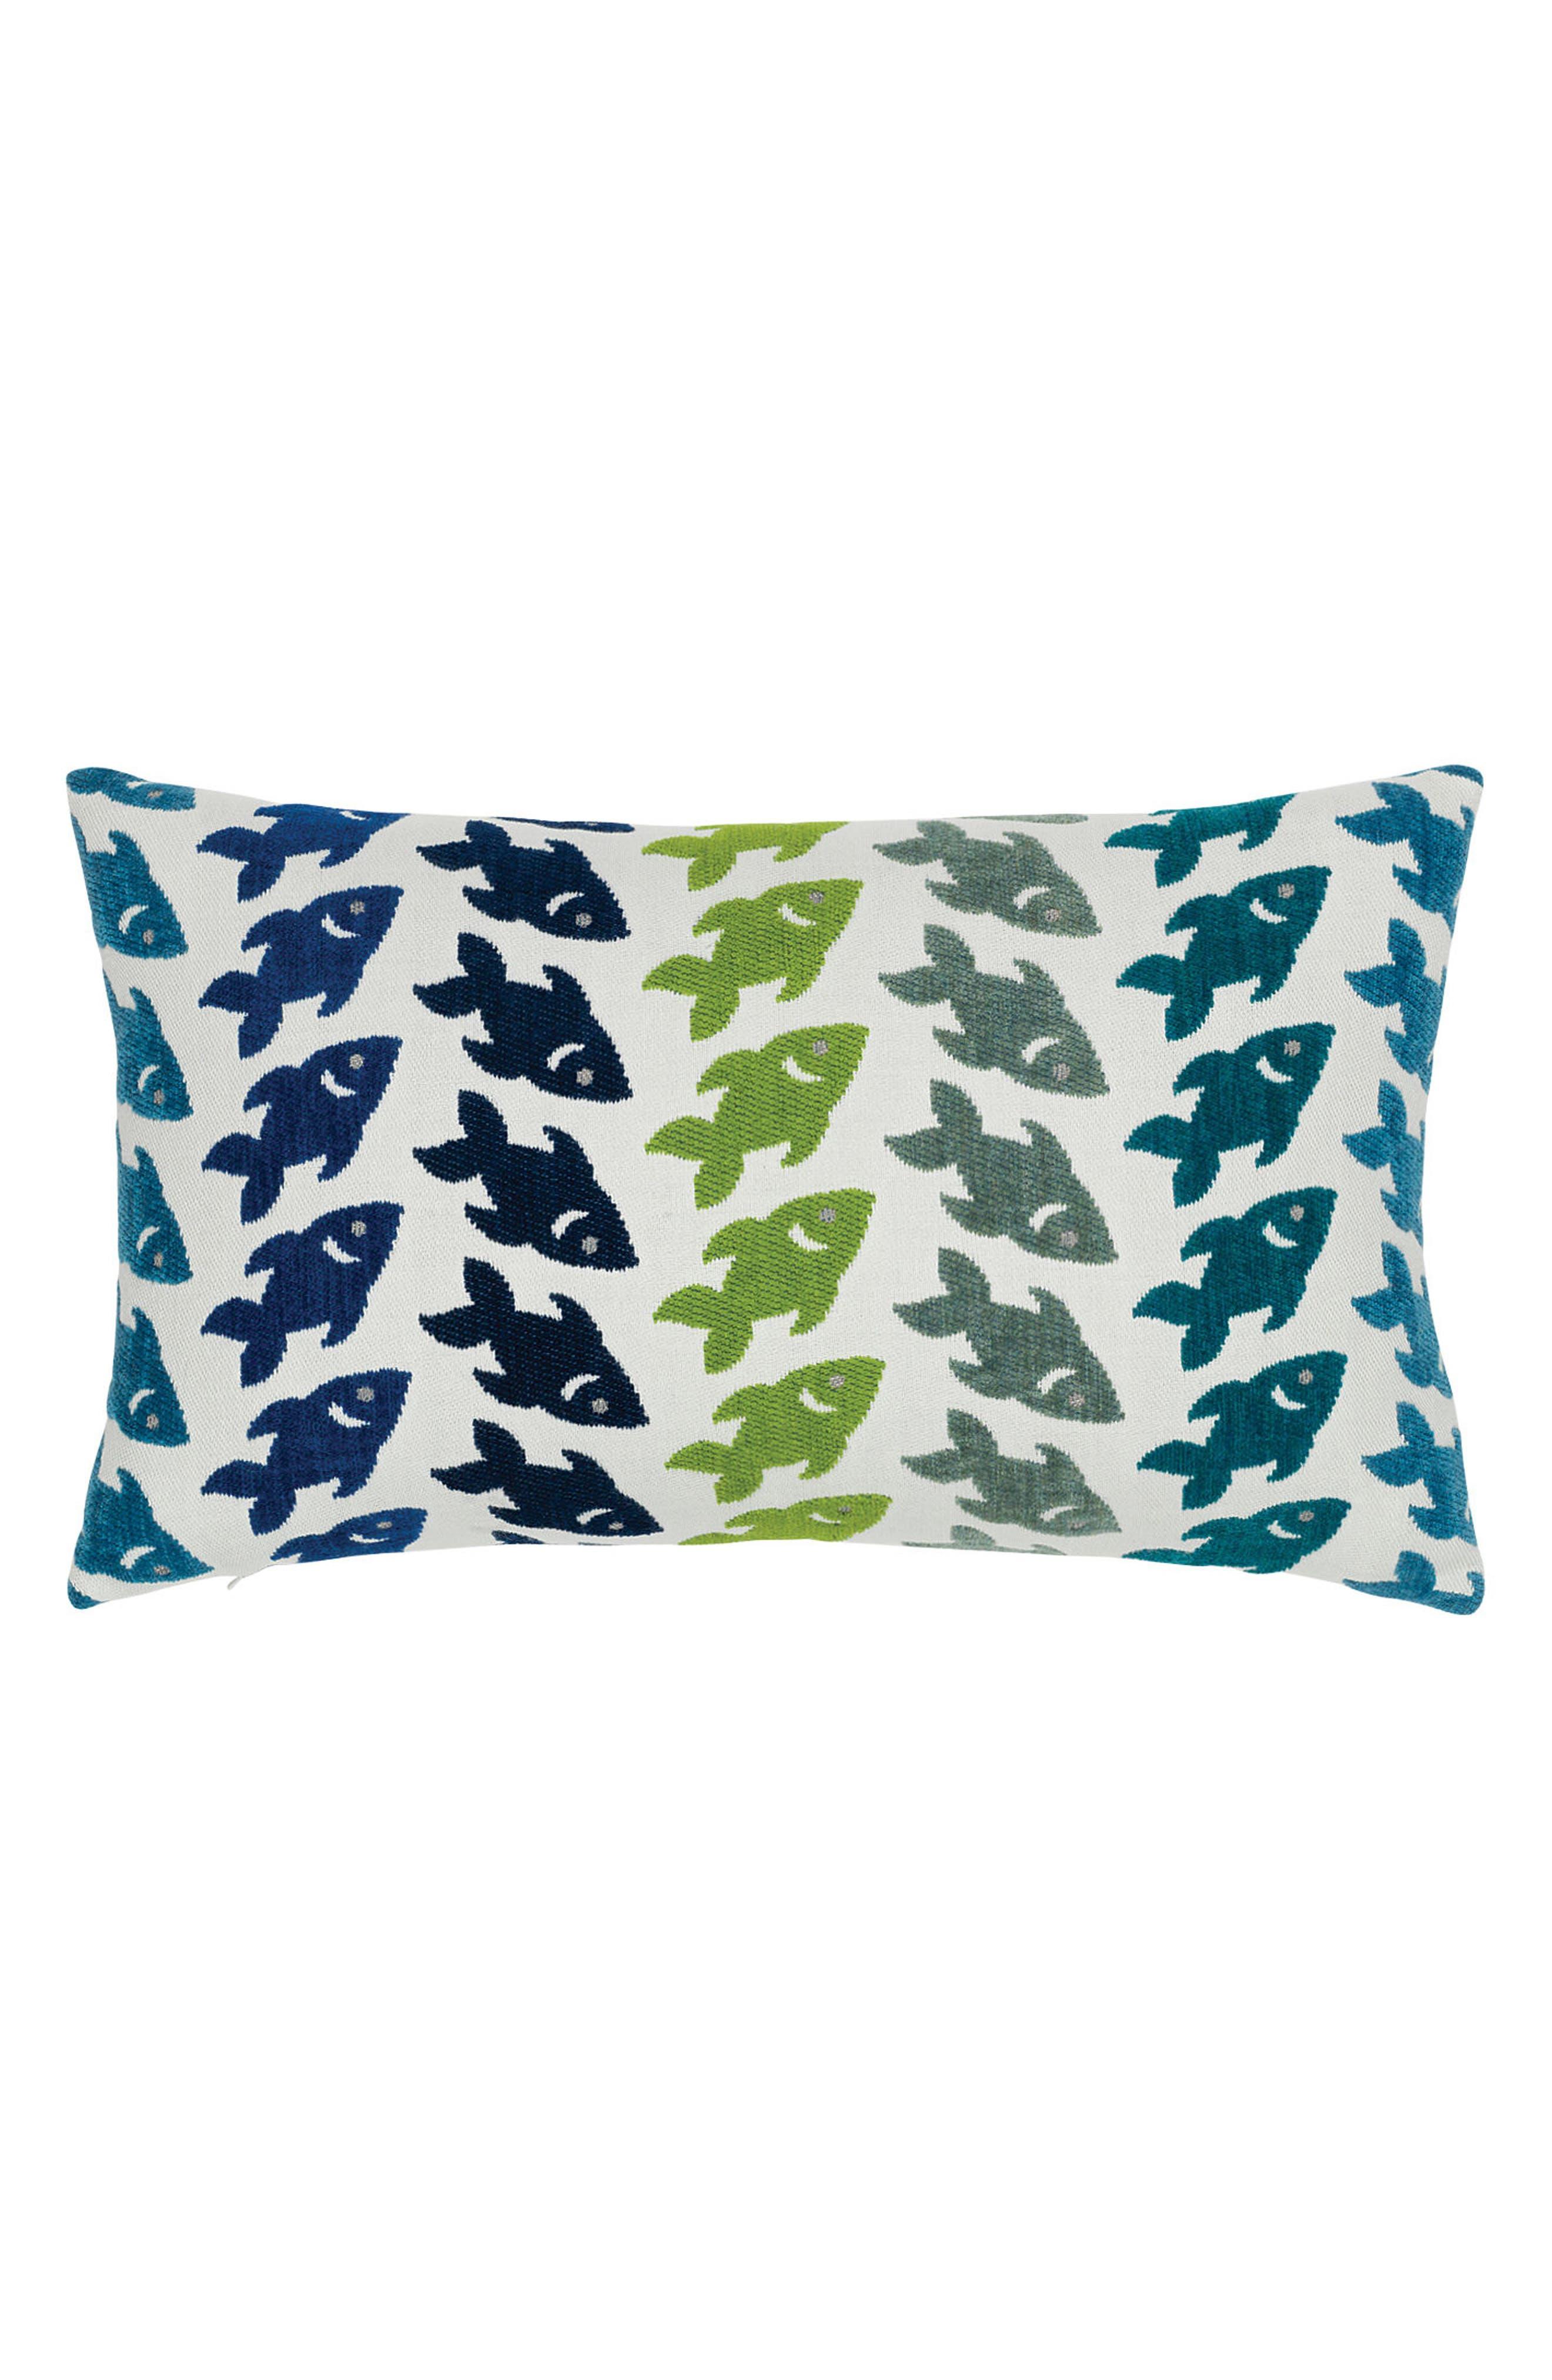 Oceana Deep Sea Lumbar Pillow,                             Main thumbnail 1, color,                             BLUE/ GREEN